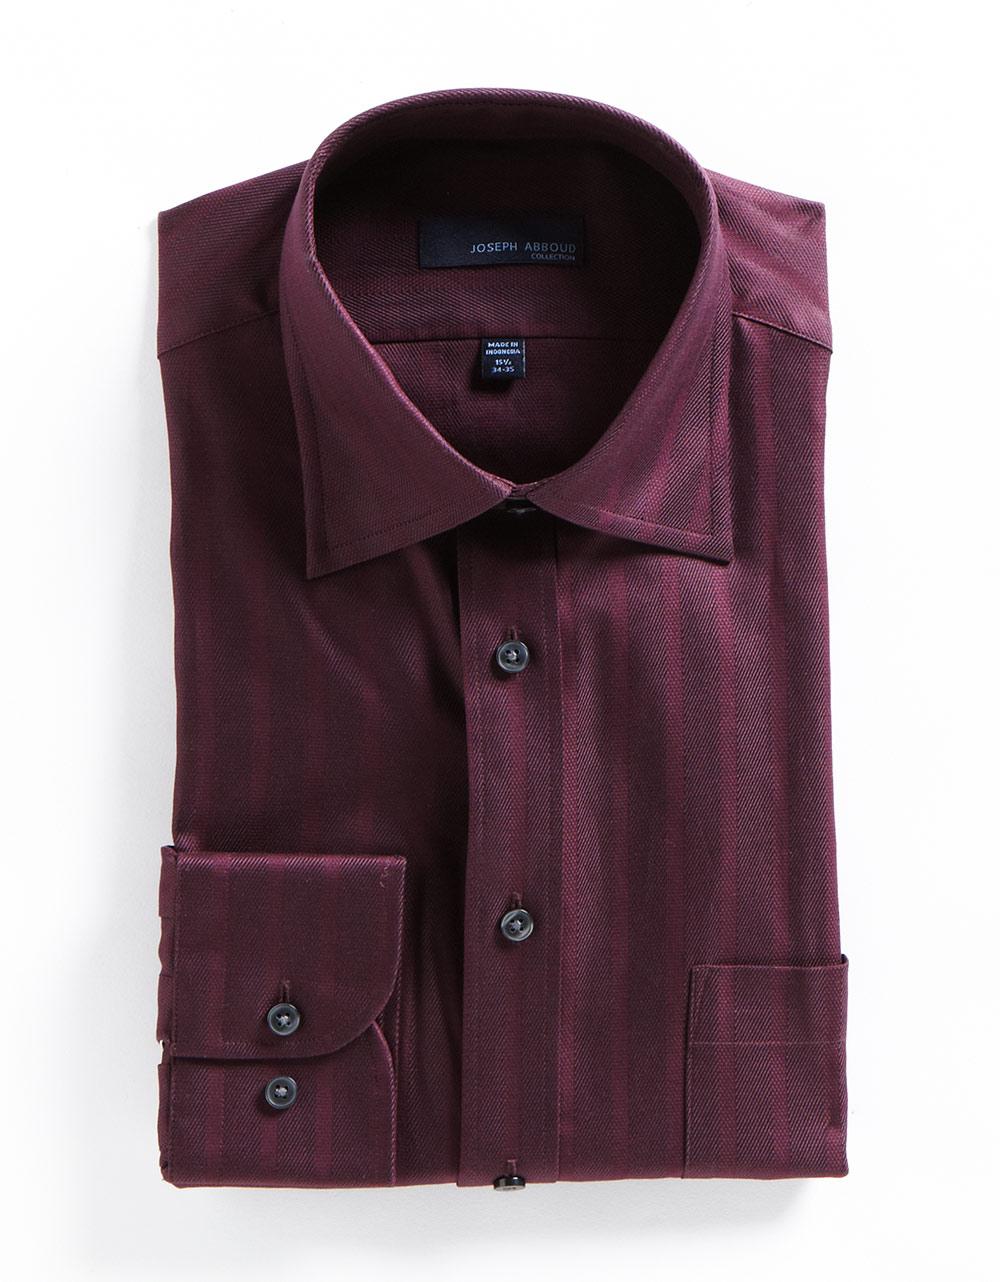 Joseph abboud textured striped cotton dress shirt in for for Joseph abboud dress shirt